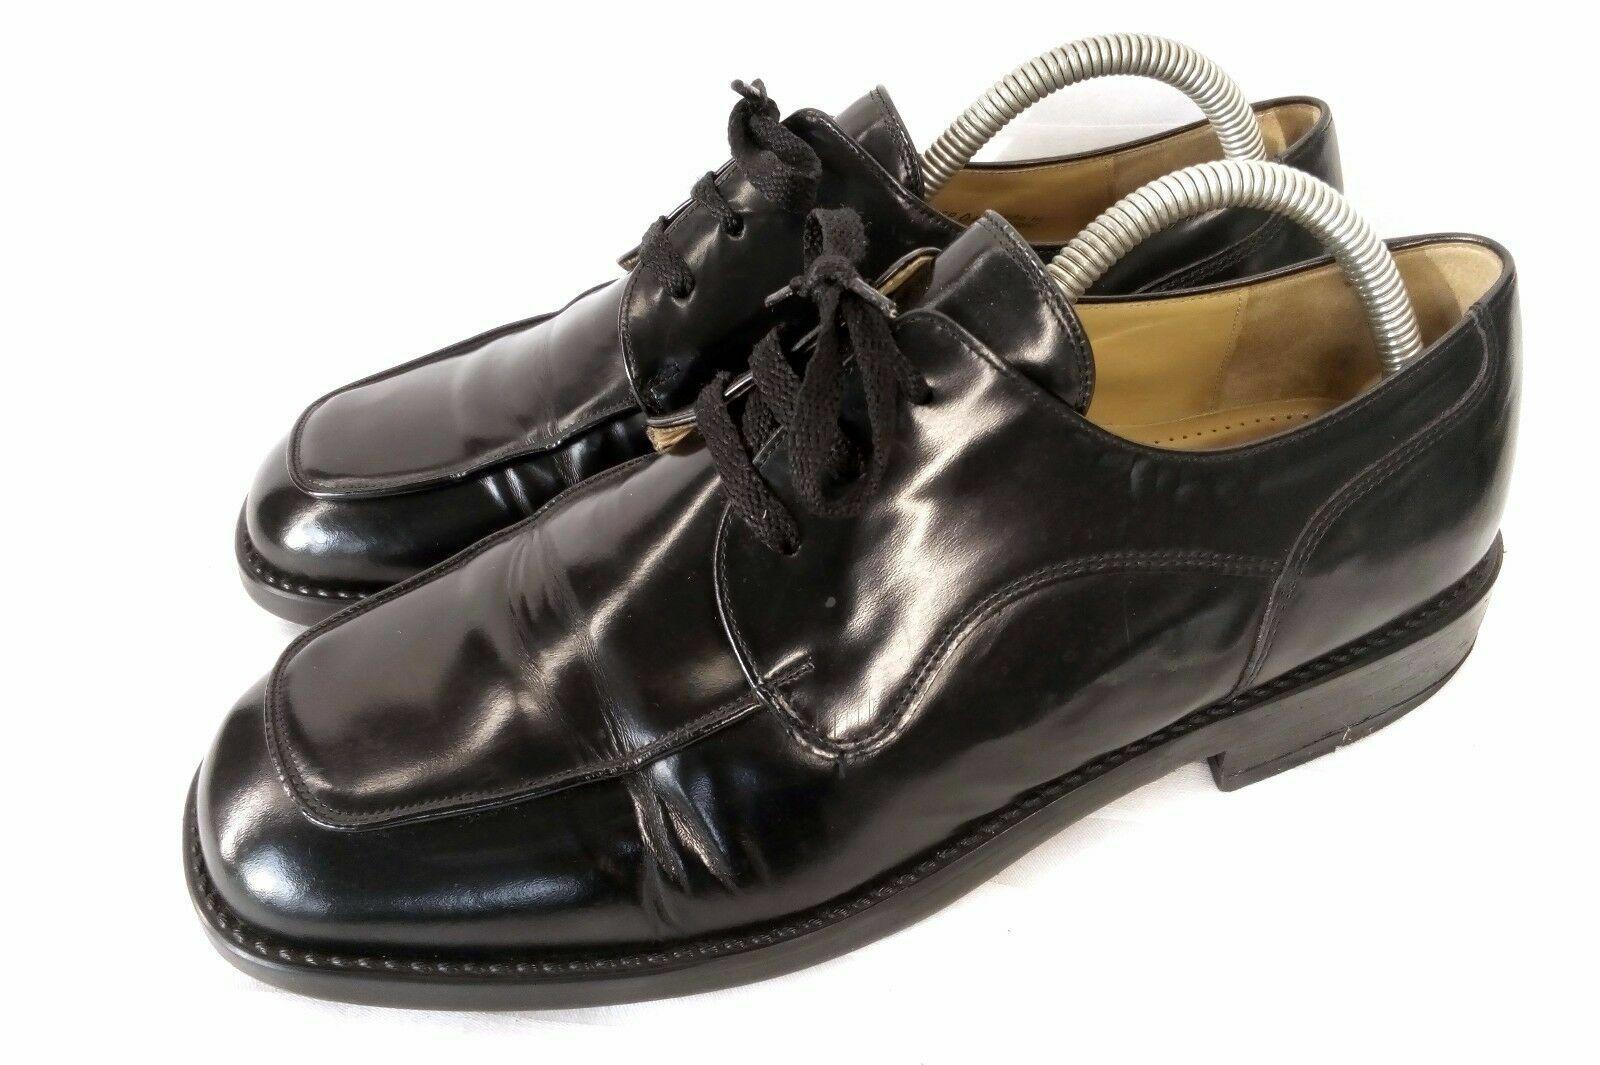 Gabor Elegant Apron Toe Derby Business Chaussures Hommes Noir Cuir UK 9 Taille 43